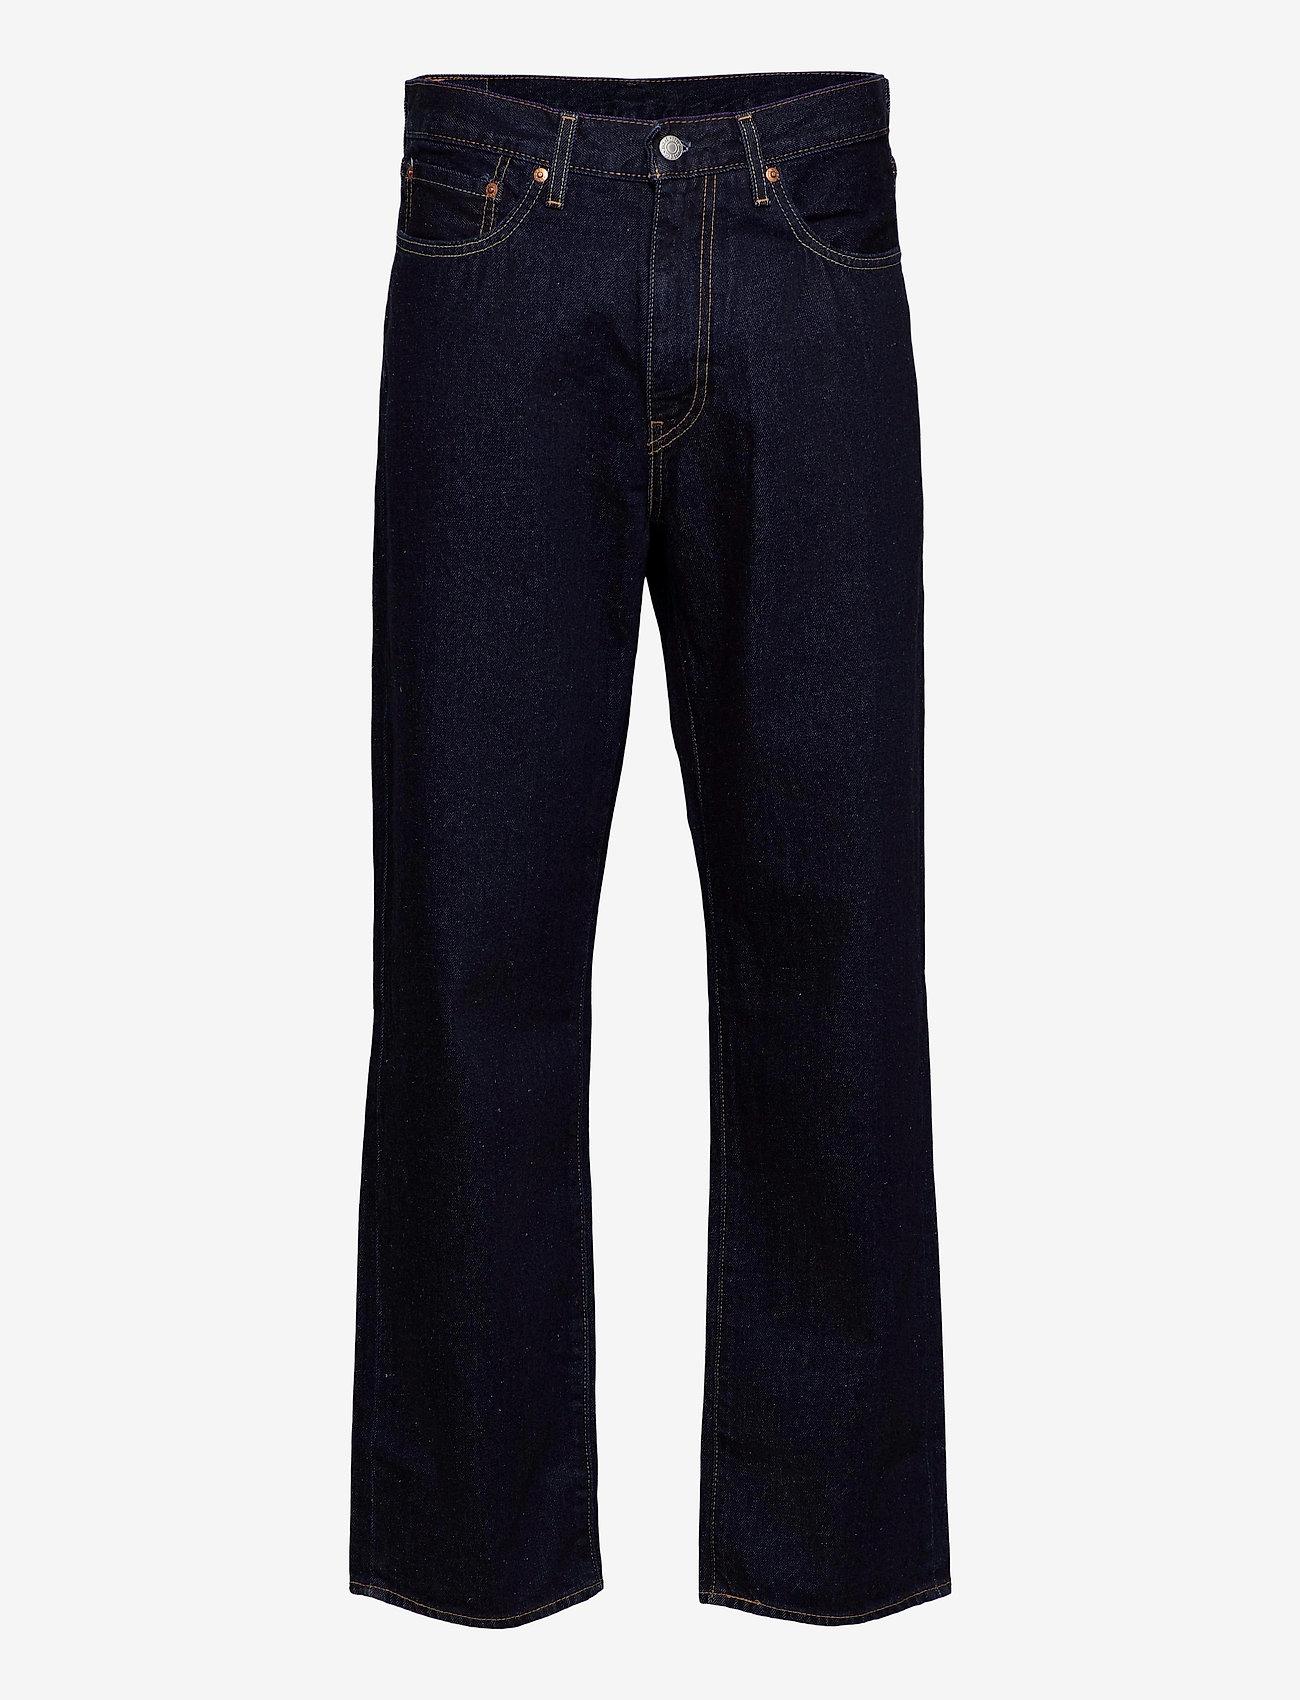 LEVI´S Men - STAY LOOSE DENIM SPOTTED ROAD - regular jeans - dark indigo - flat finish - 1